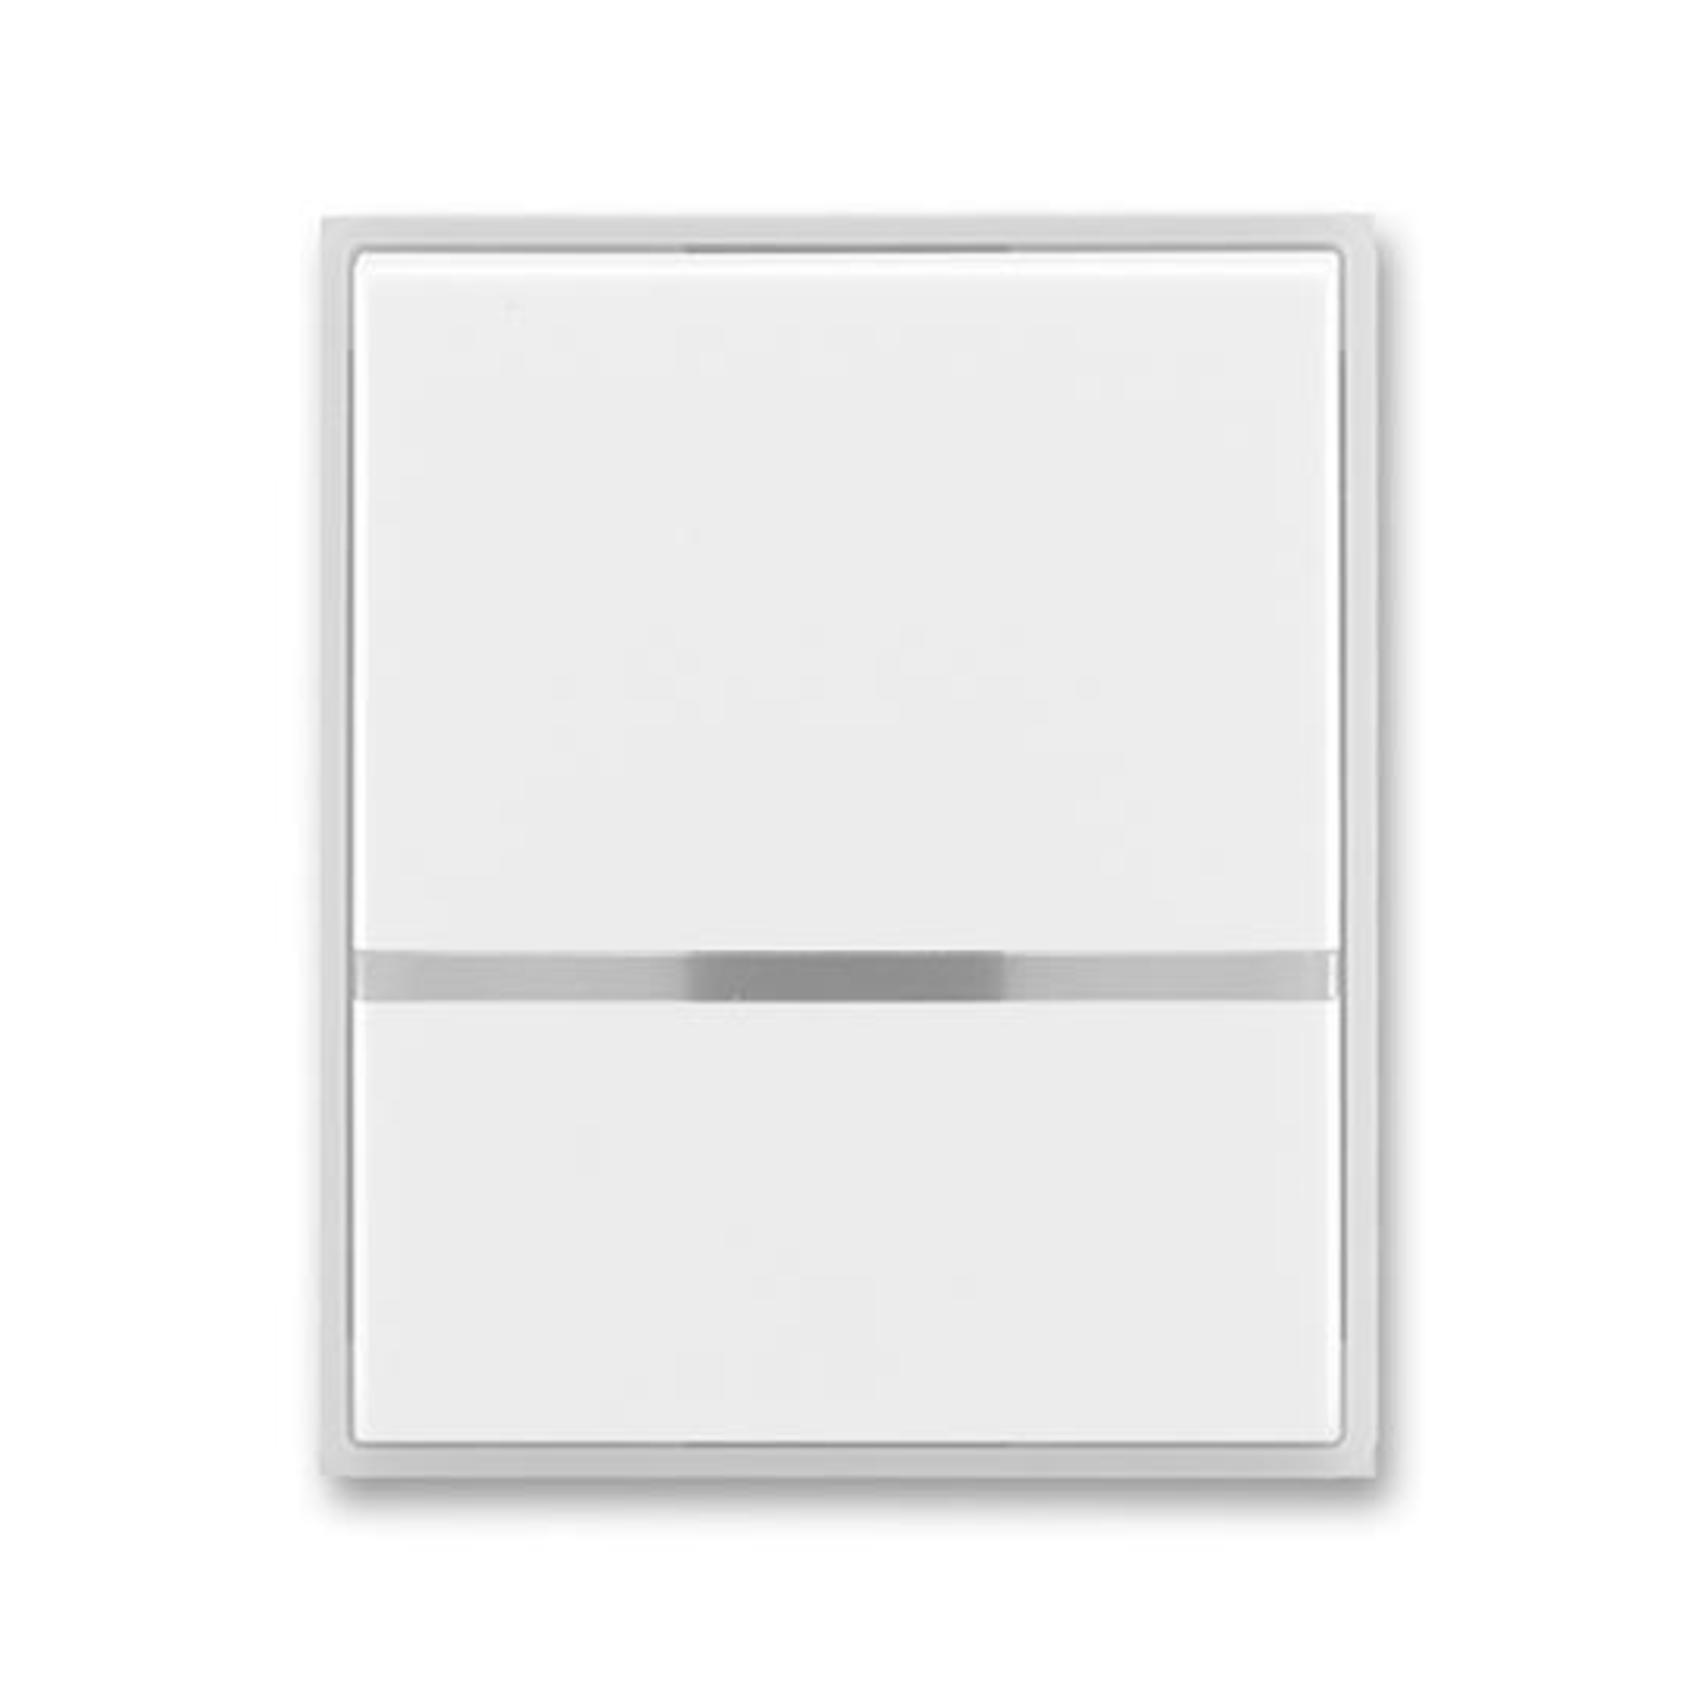 ABB 3558E-A00653 01 Element Kryt spínače jednoduchý, s průzorem